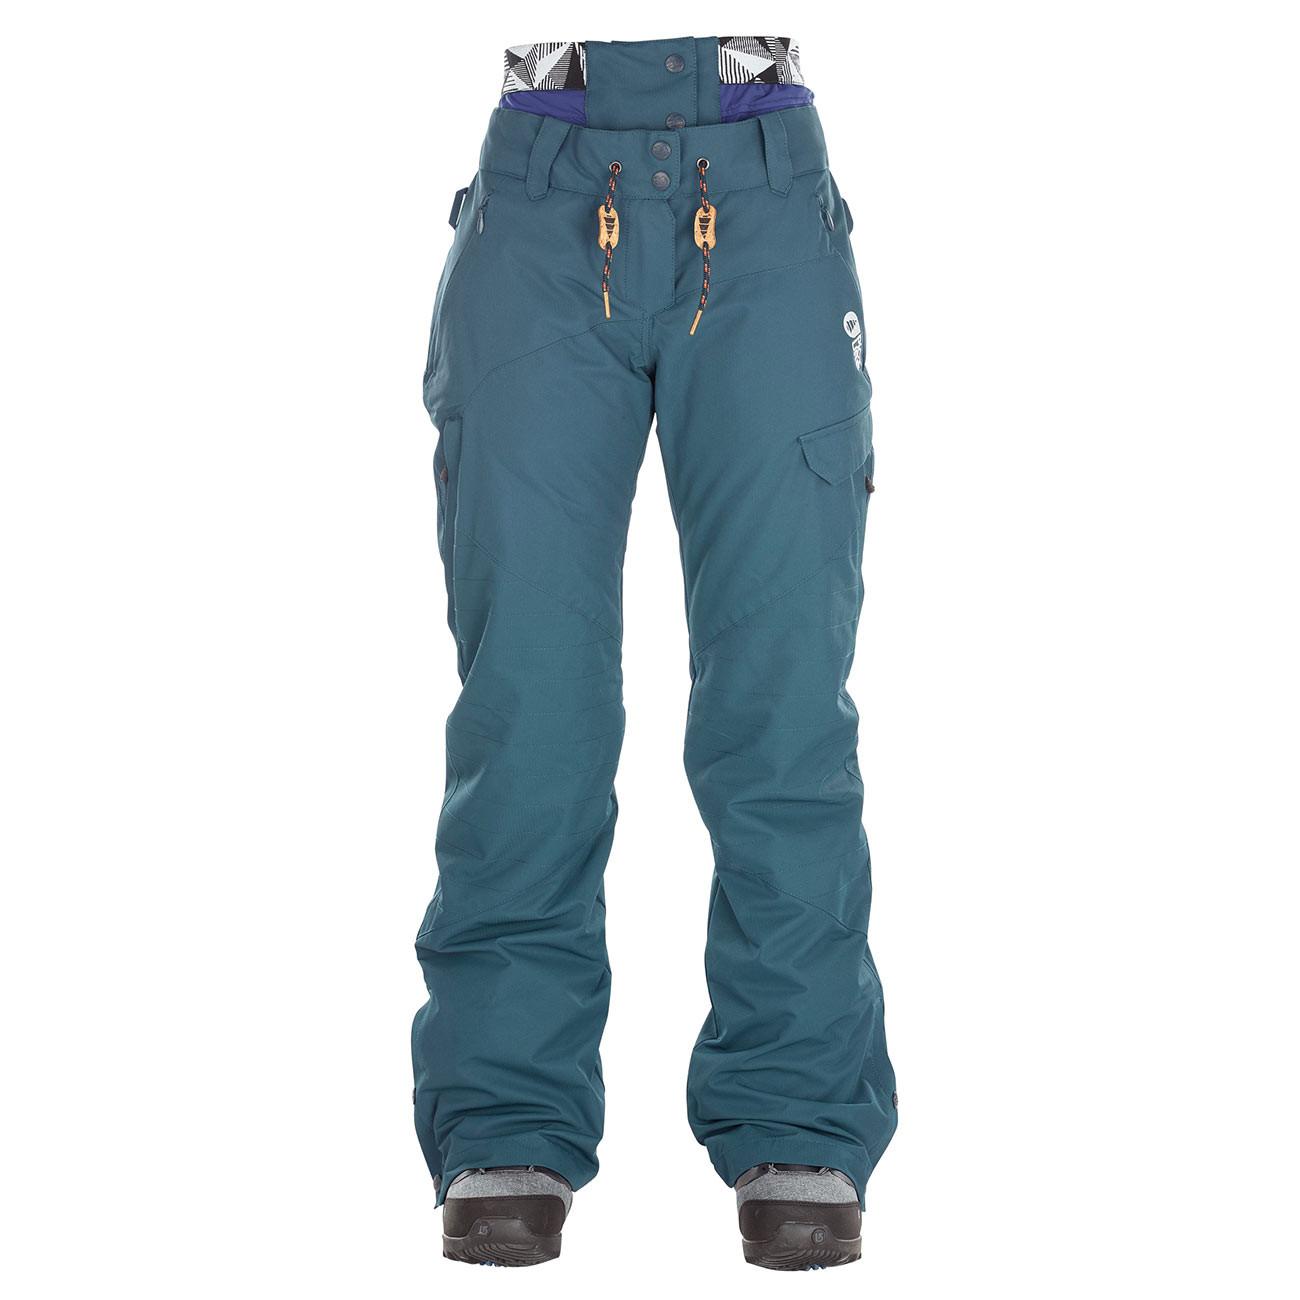 Kalhoty Picture Treva petrol blue